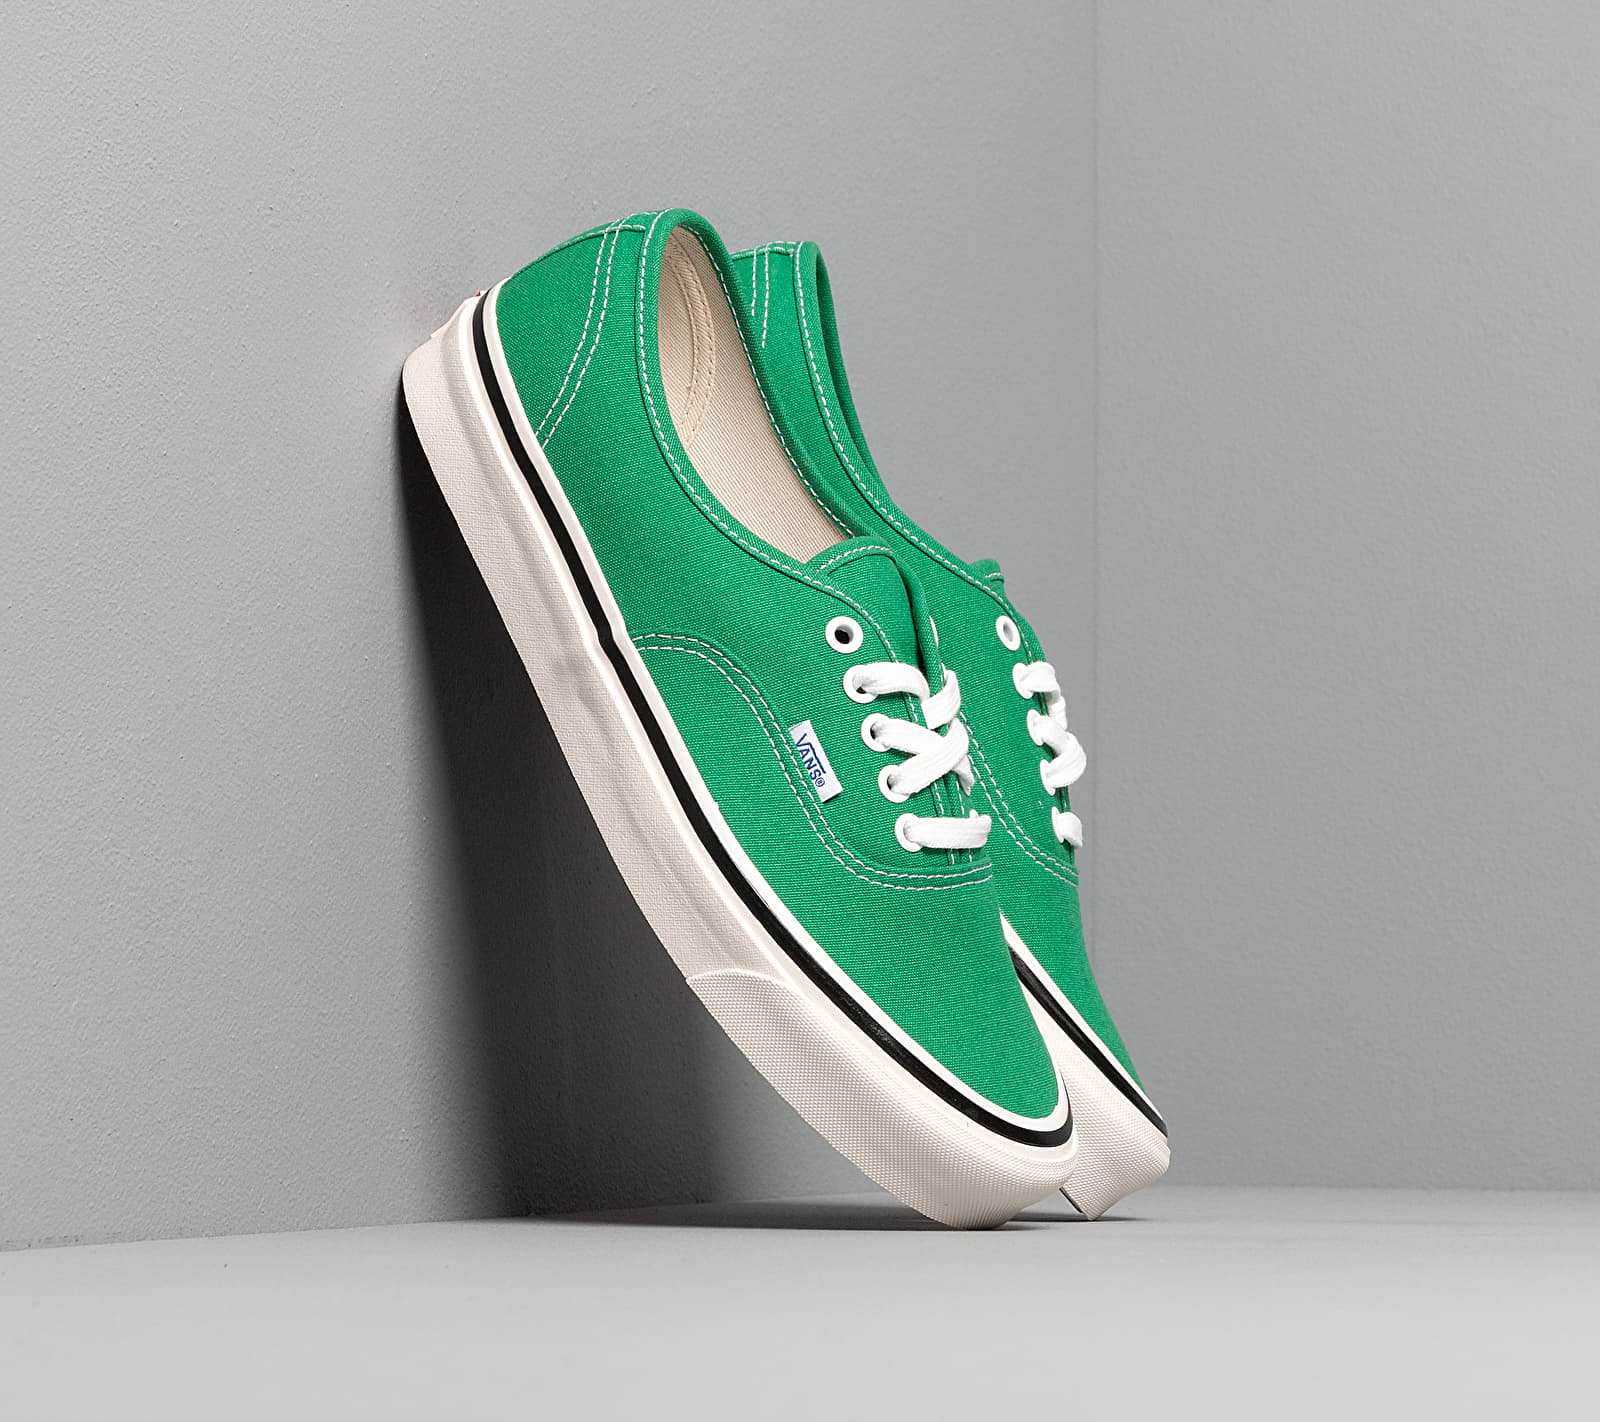 Vans Authentic 44 DX (Anaheim Factory) Og Emerald